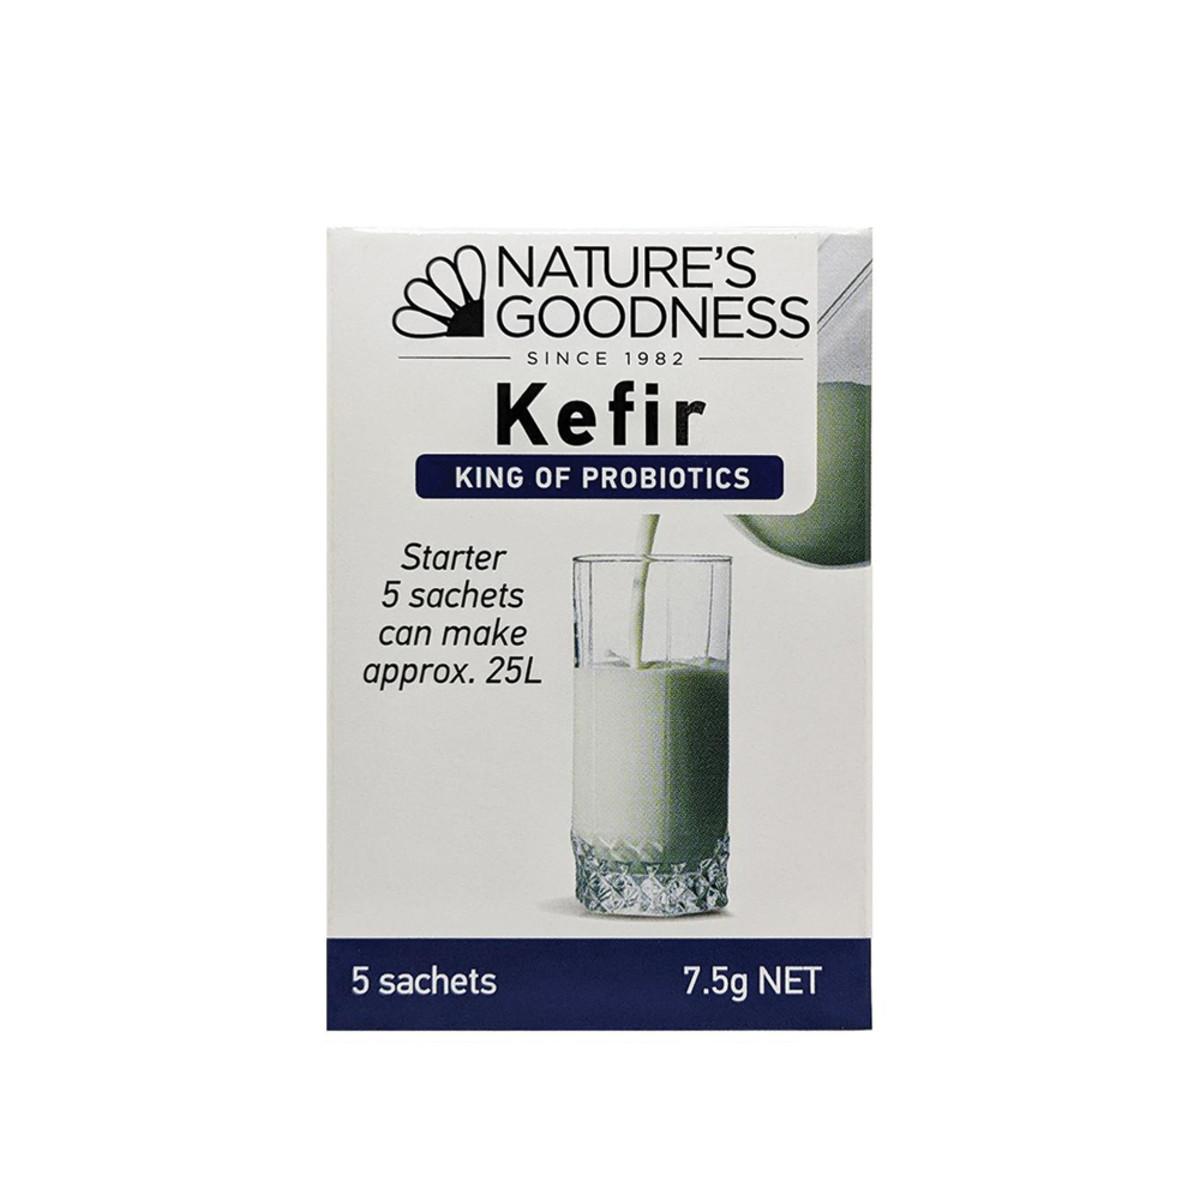 NATURE'S GOODNESS KEFIR TURKISH YOGHURT PROBIOTIC 7.5G